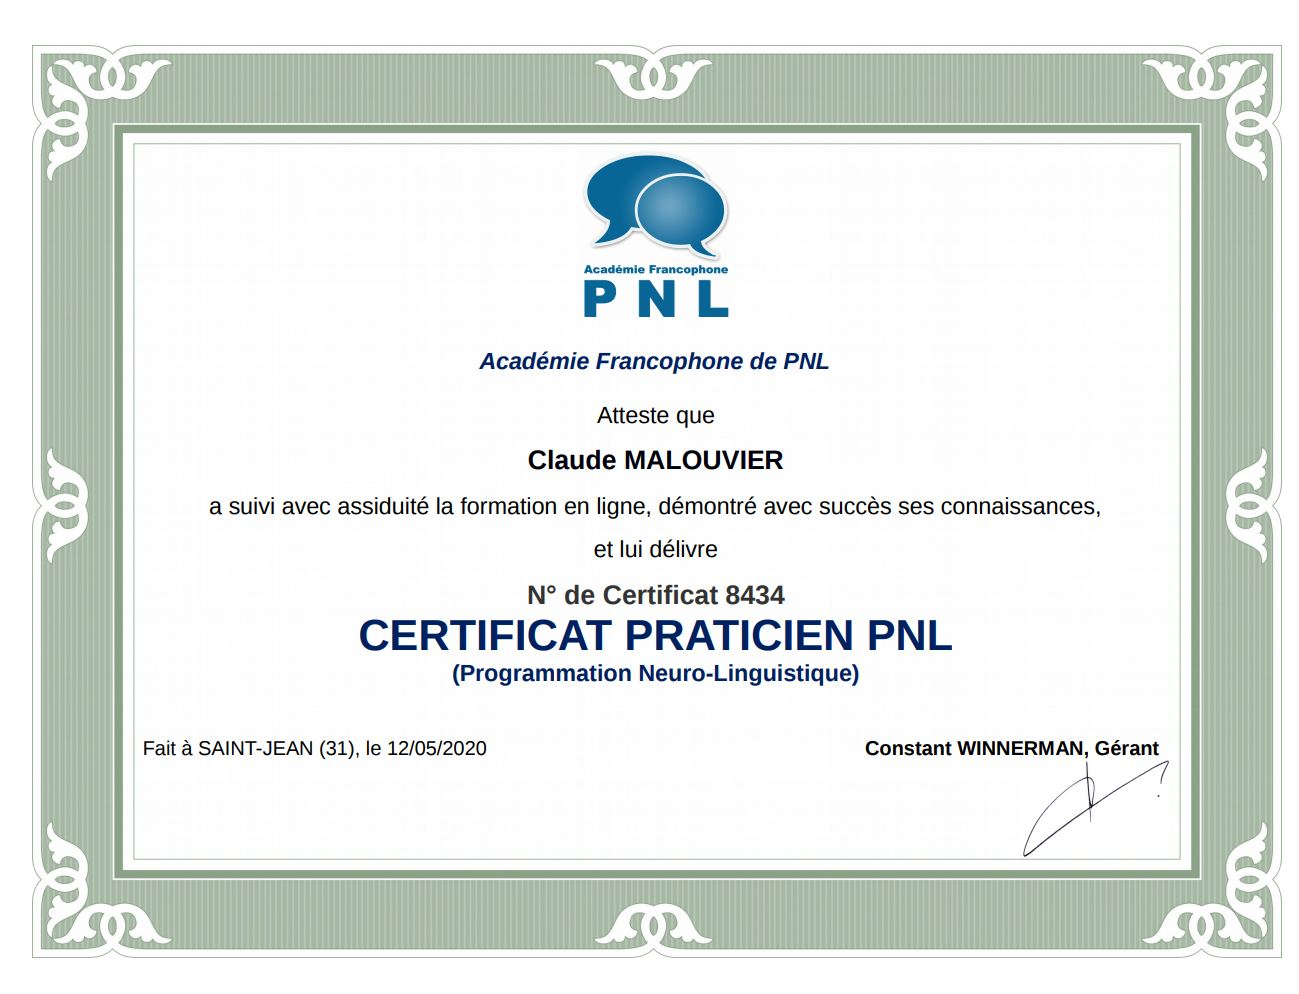 Praticien PNL - Sénart 77 - Claude Malouvier